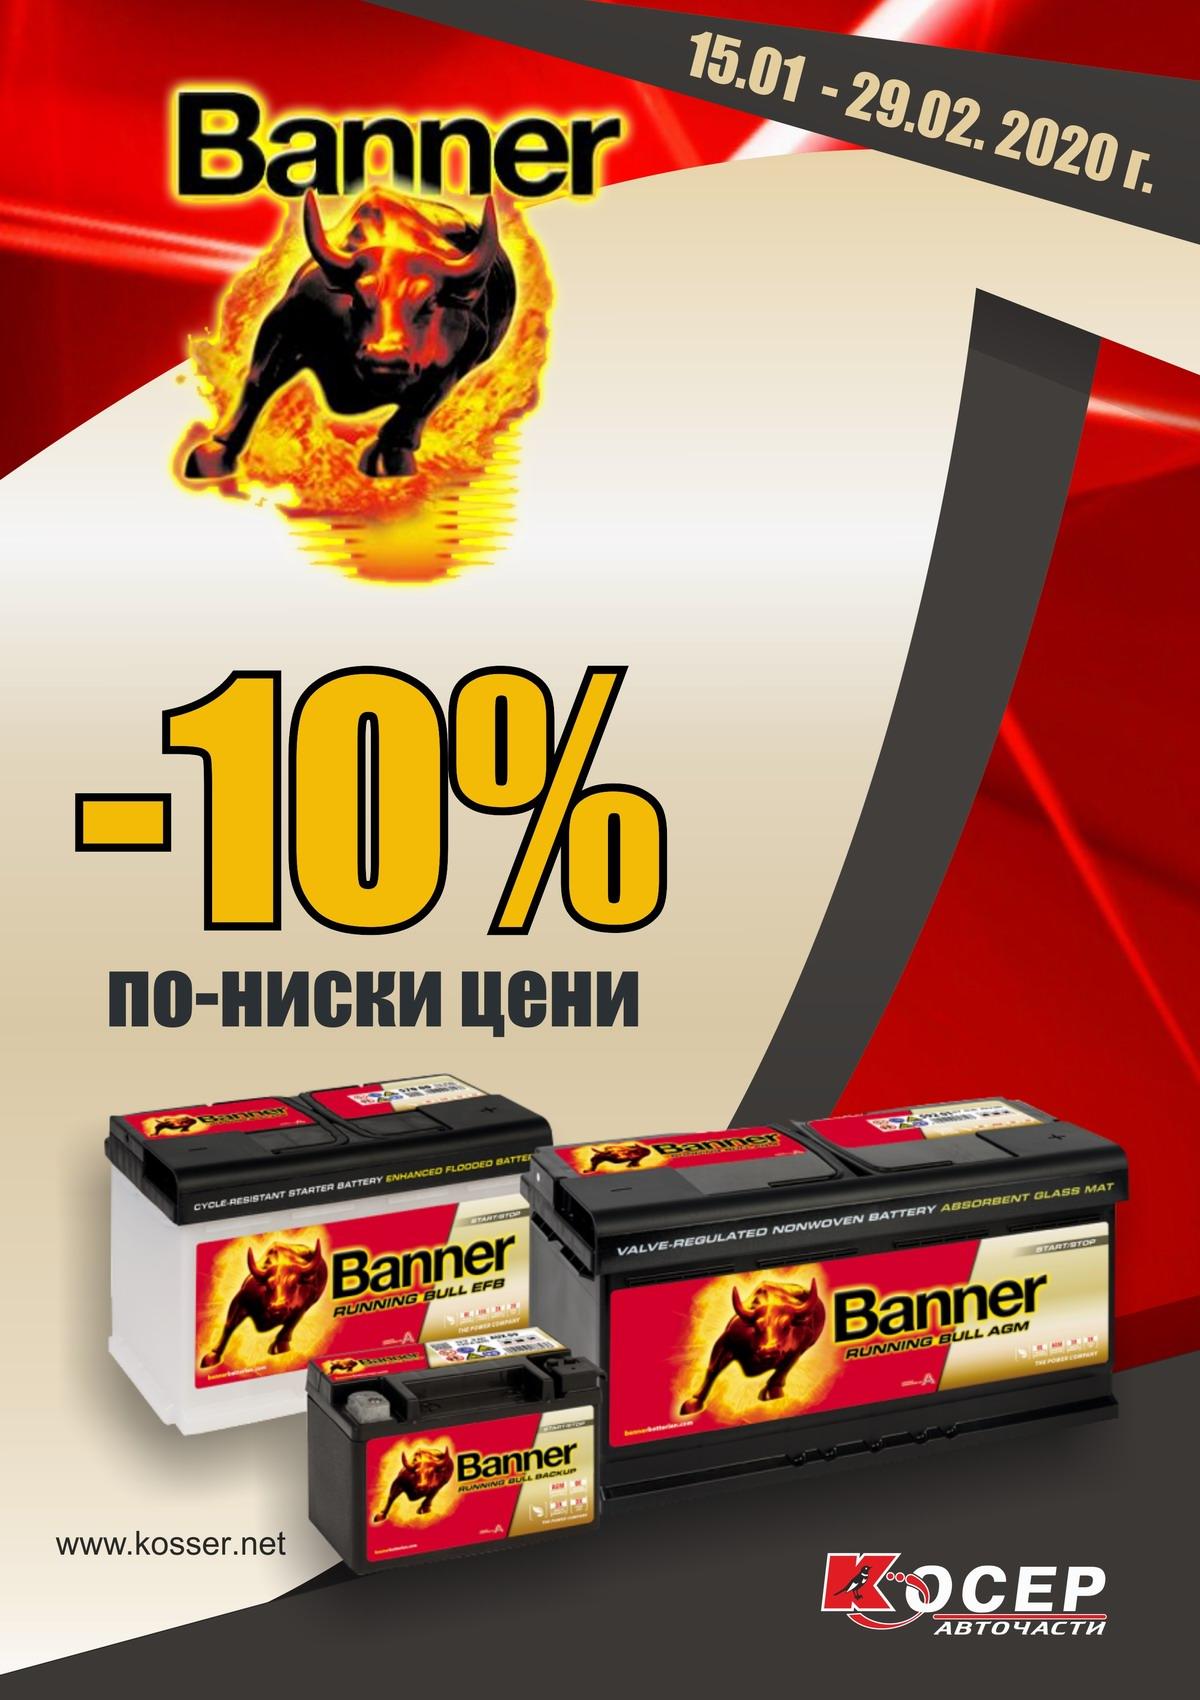 Промоция BANNER, 15.01.2020 - 29.02.2020